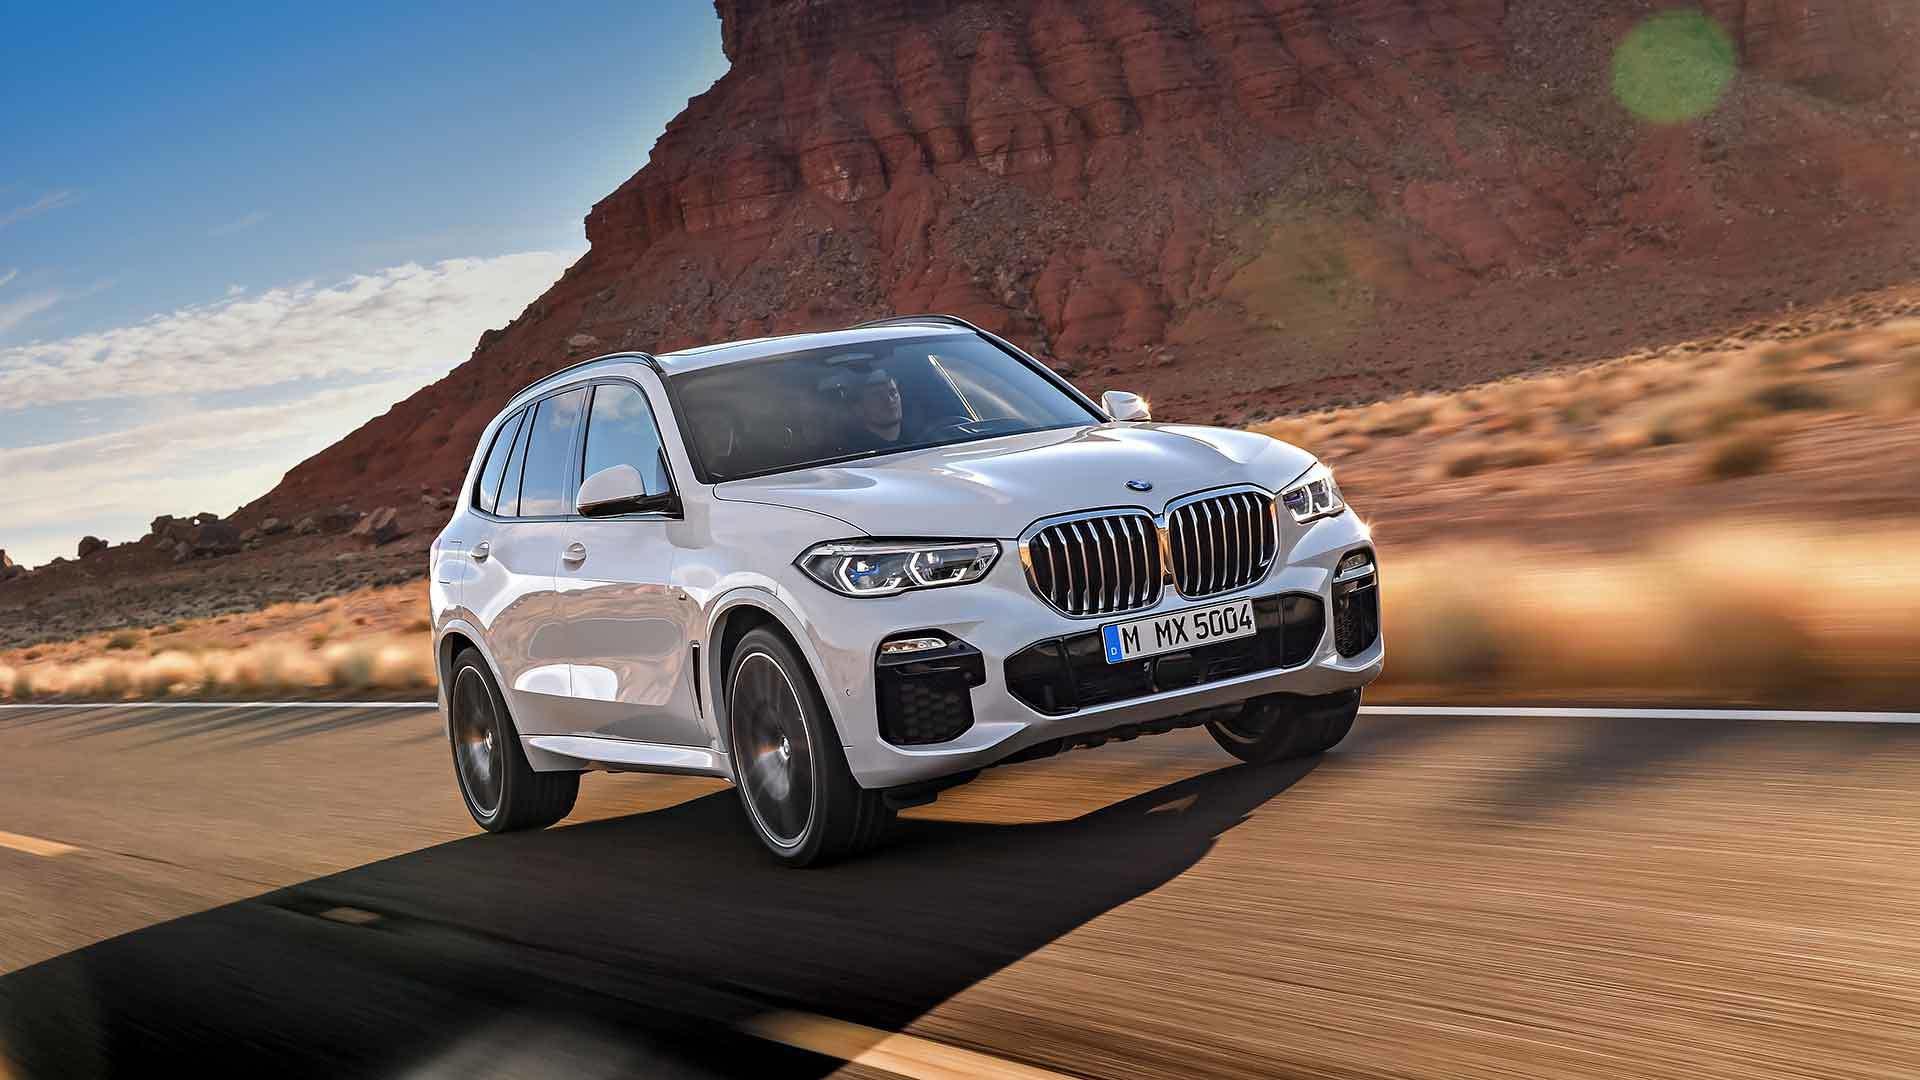 BMW-X5-G05-2019-13.jpg